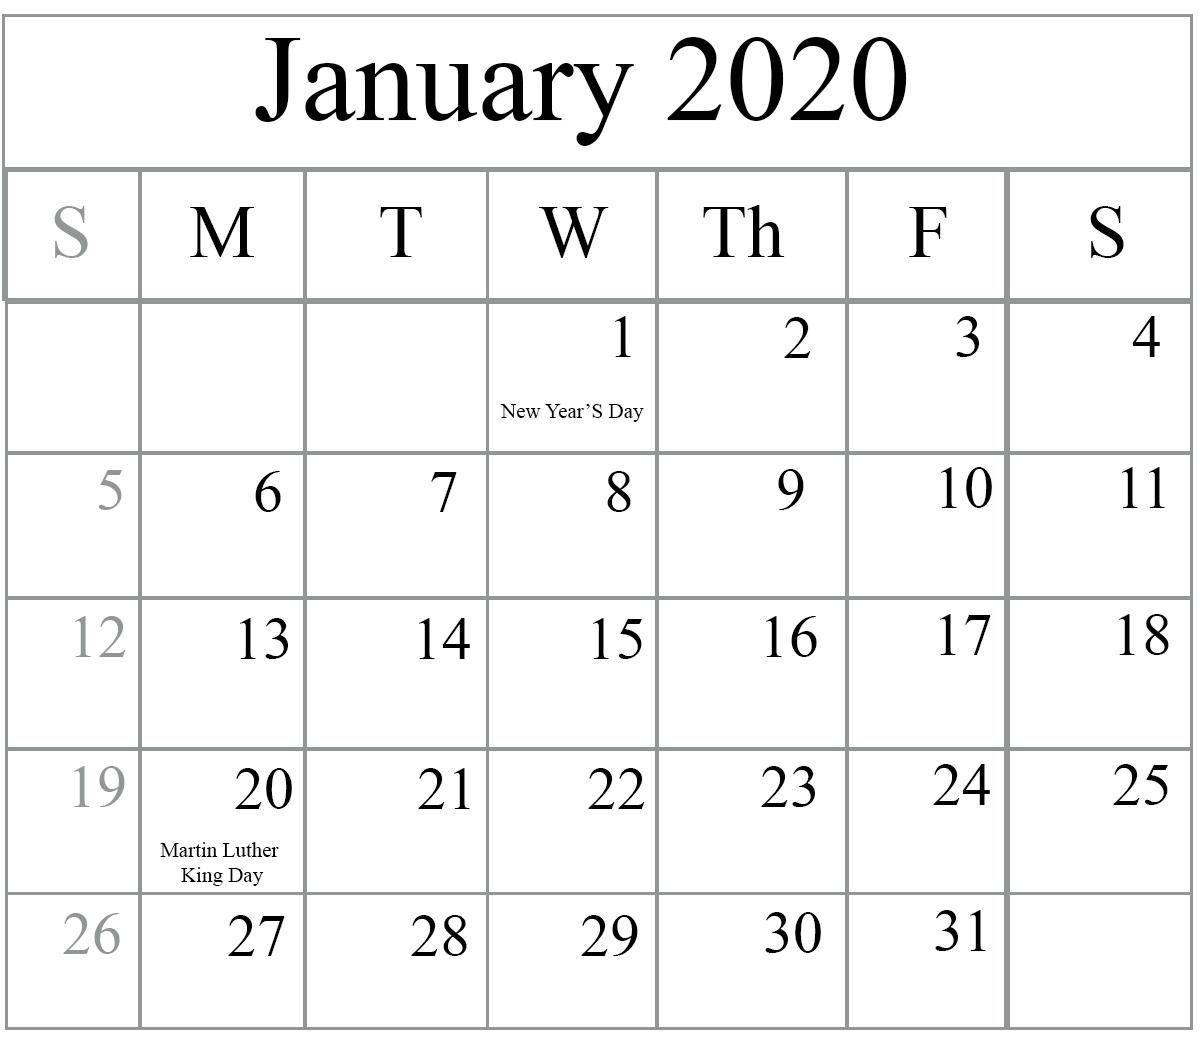 Free January 2020 Printable Calendar In Pdf, Excel & Word-January 2020 Calendar Usa